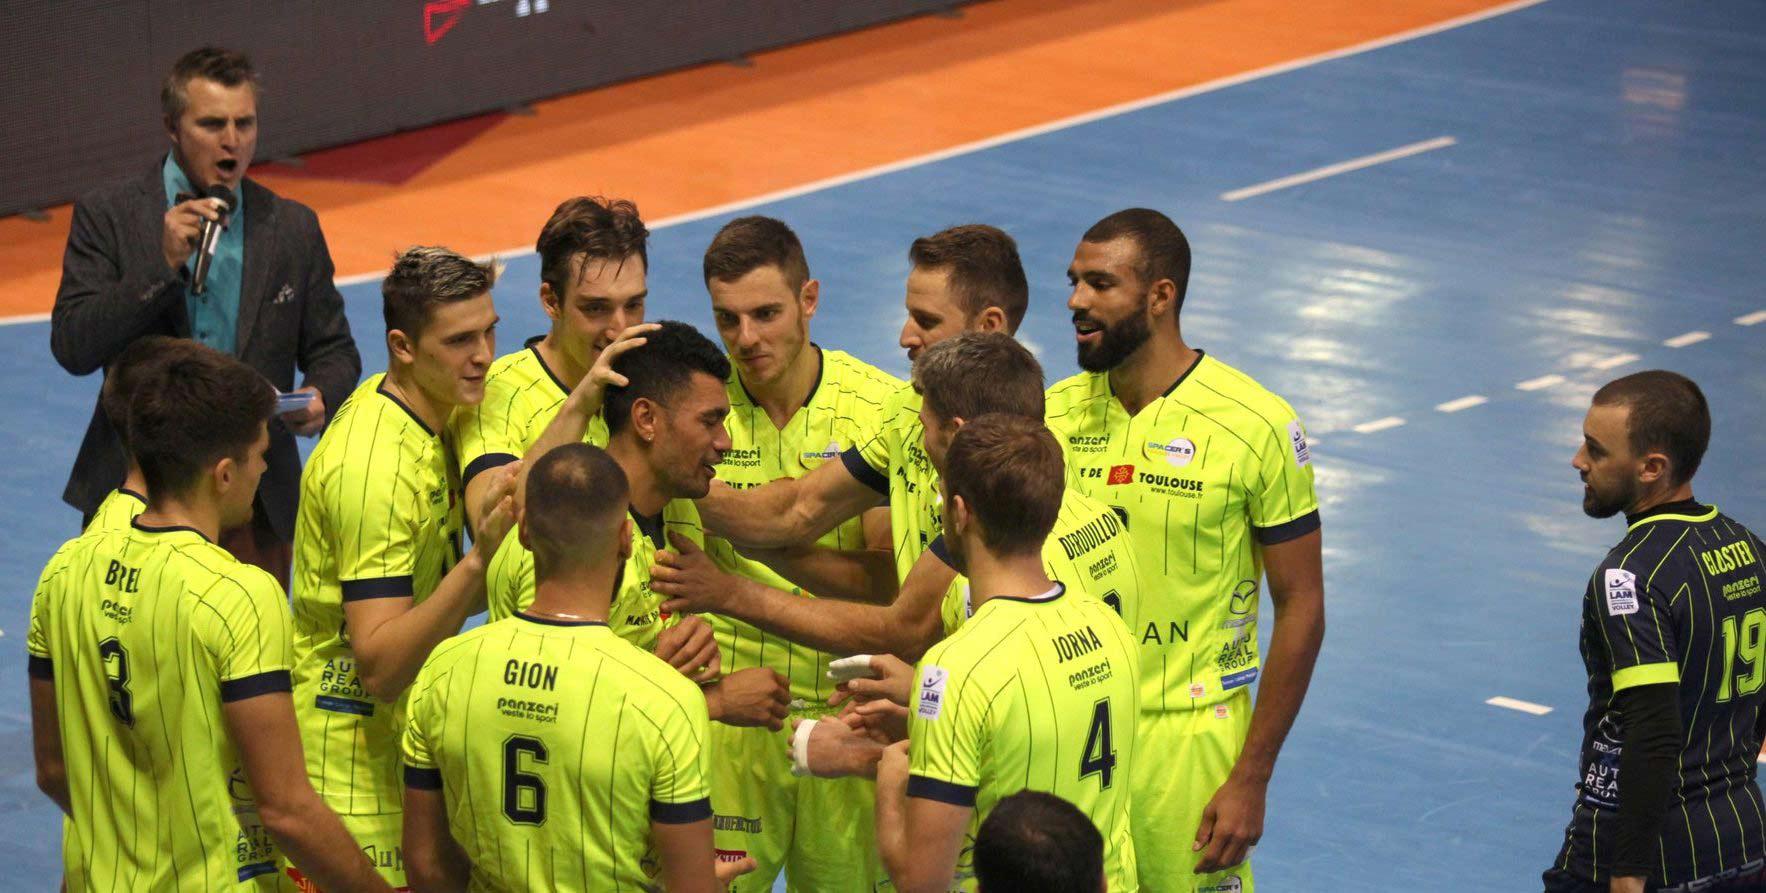 Yoan, ambianceur pour le volleyball à Toulouse